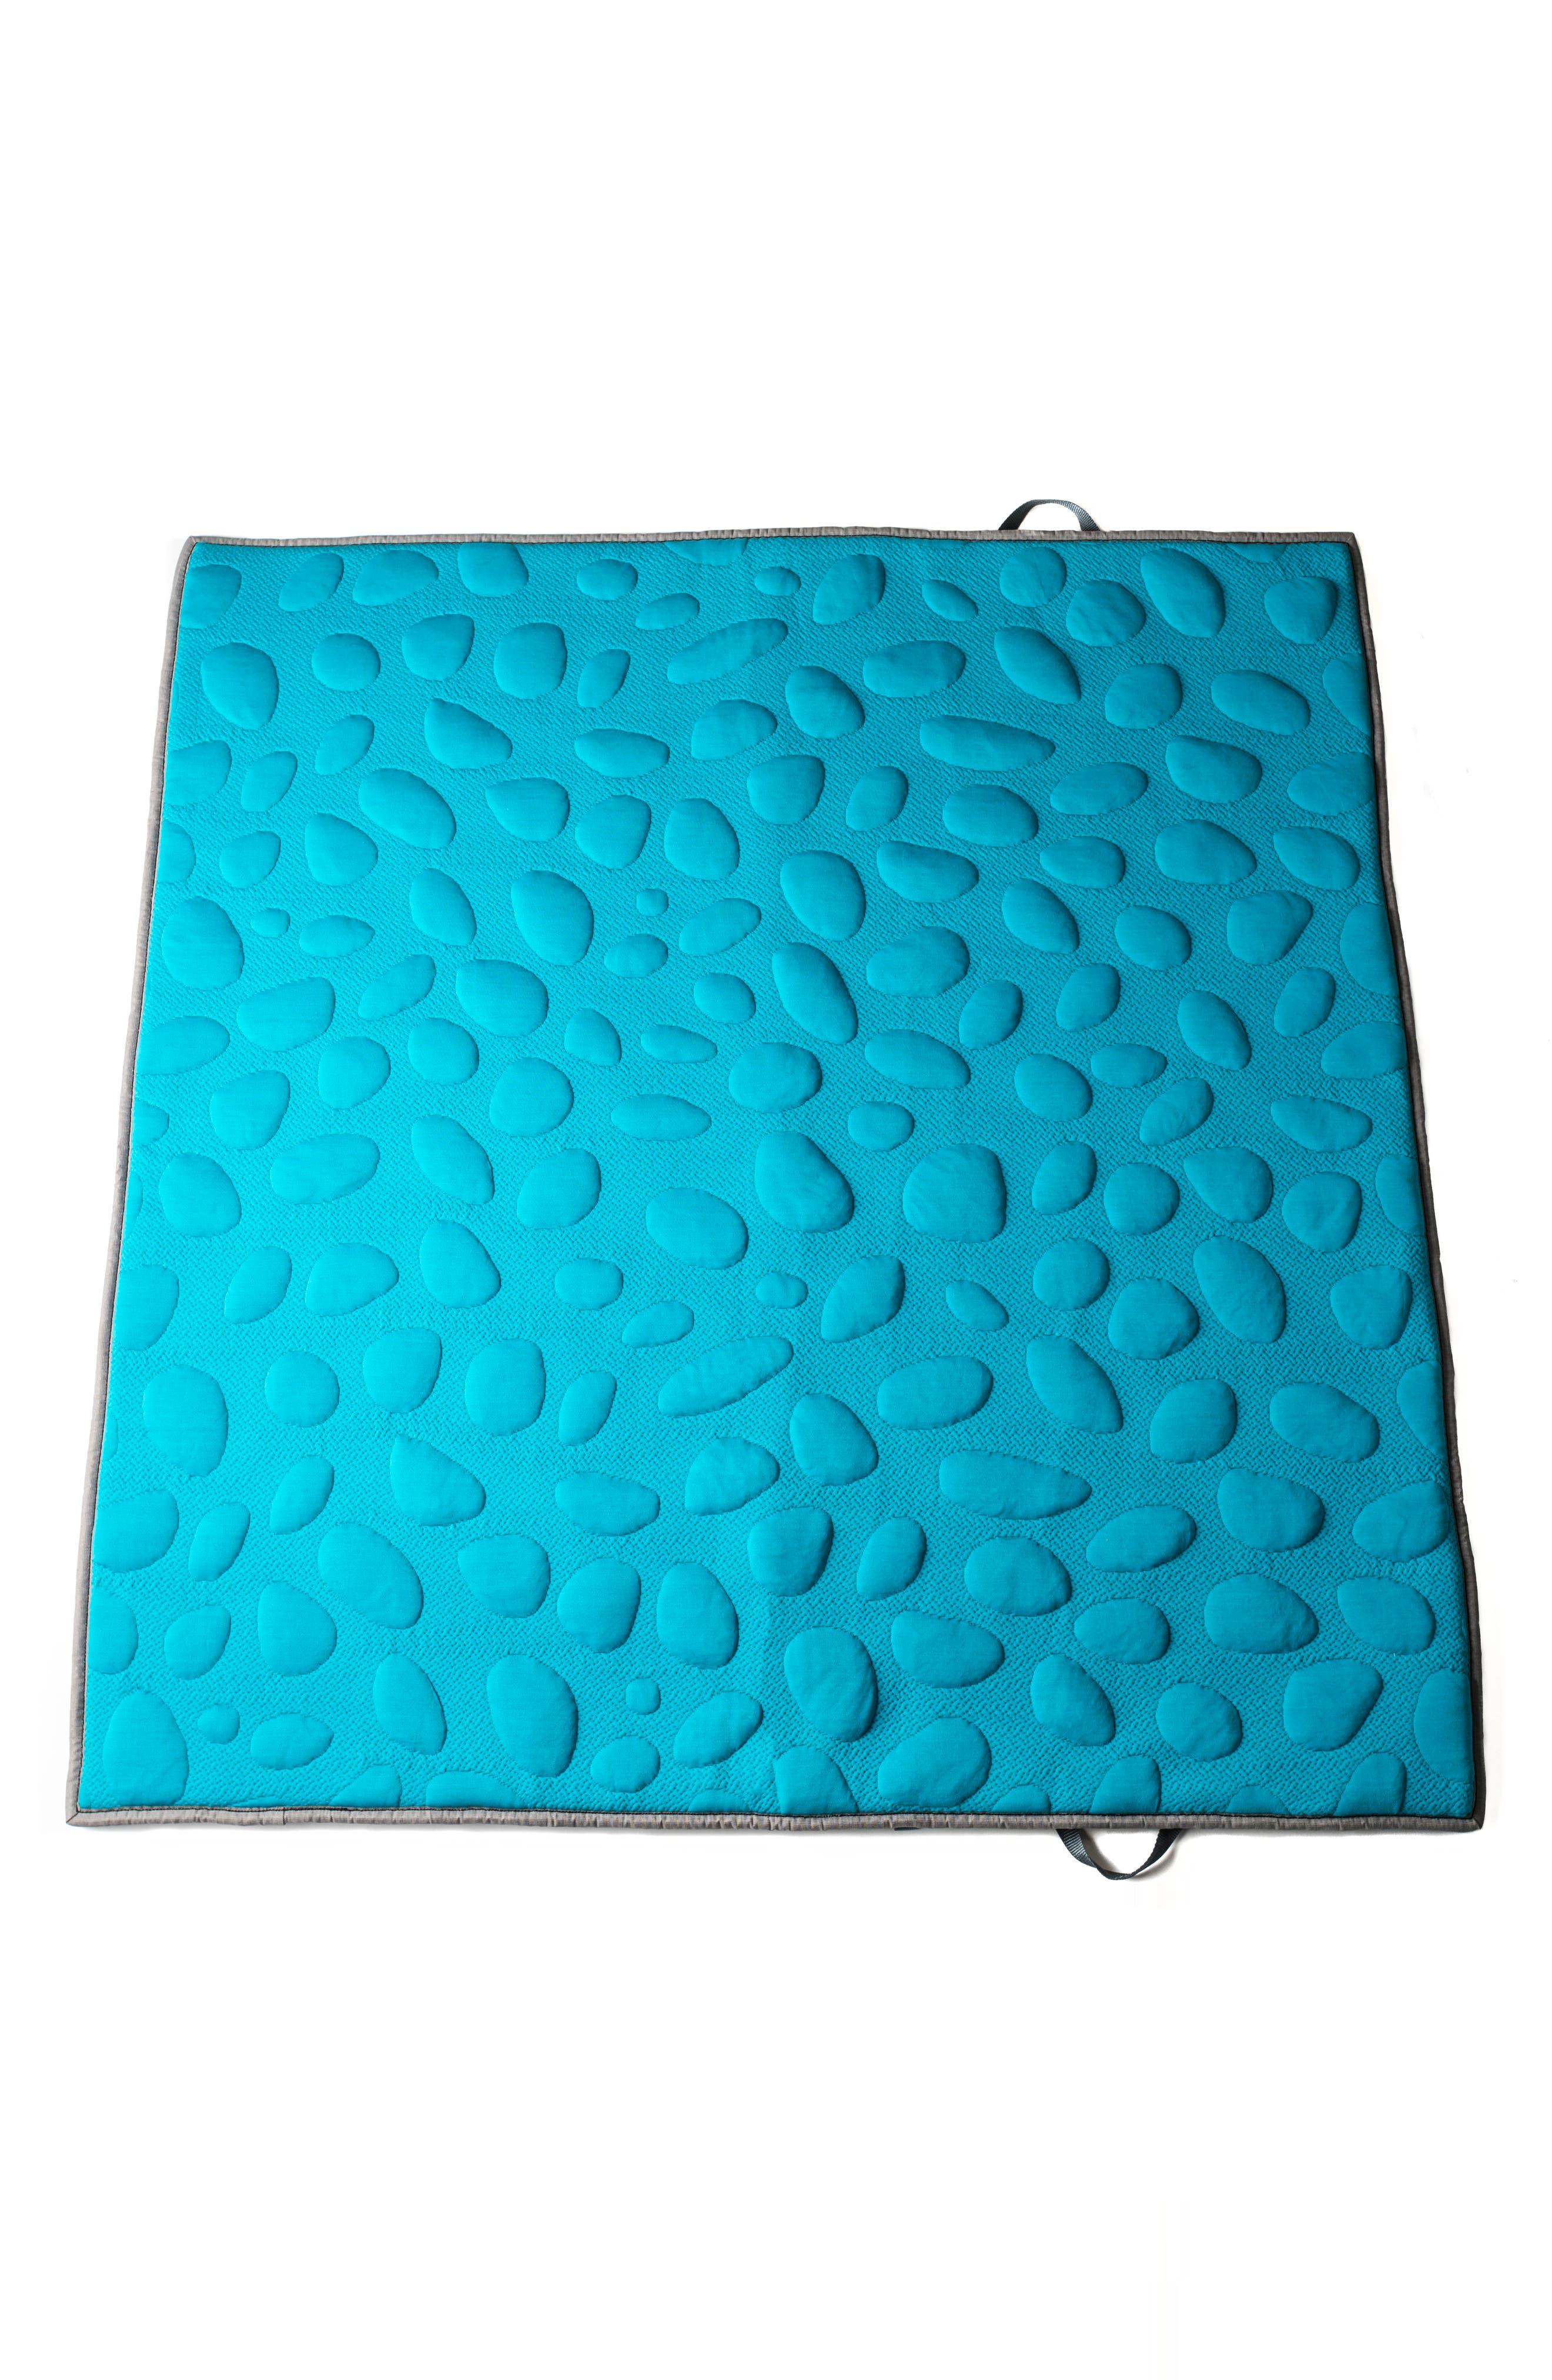 Nook Sleep Systems Pebble LilyPad Play Mat